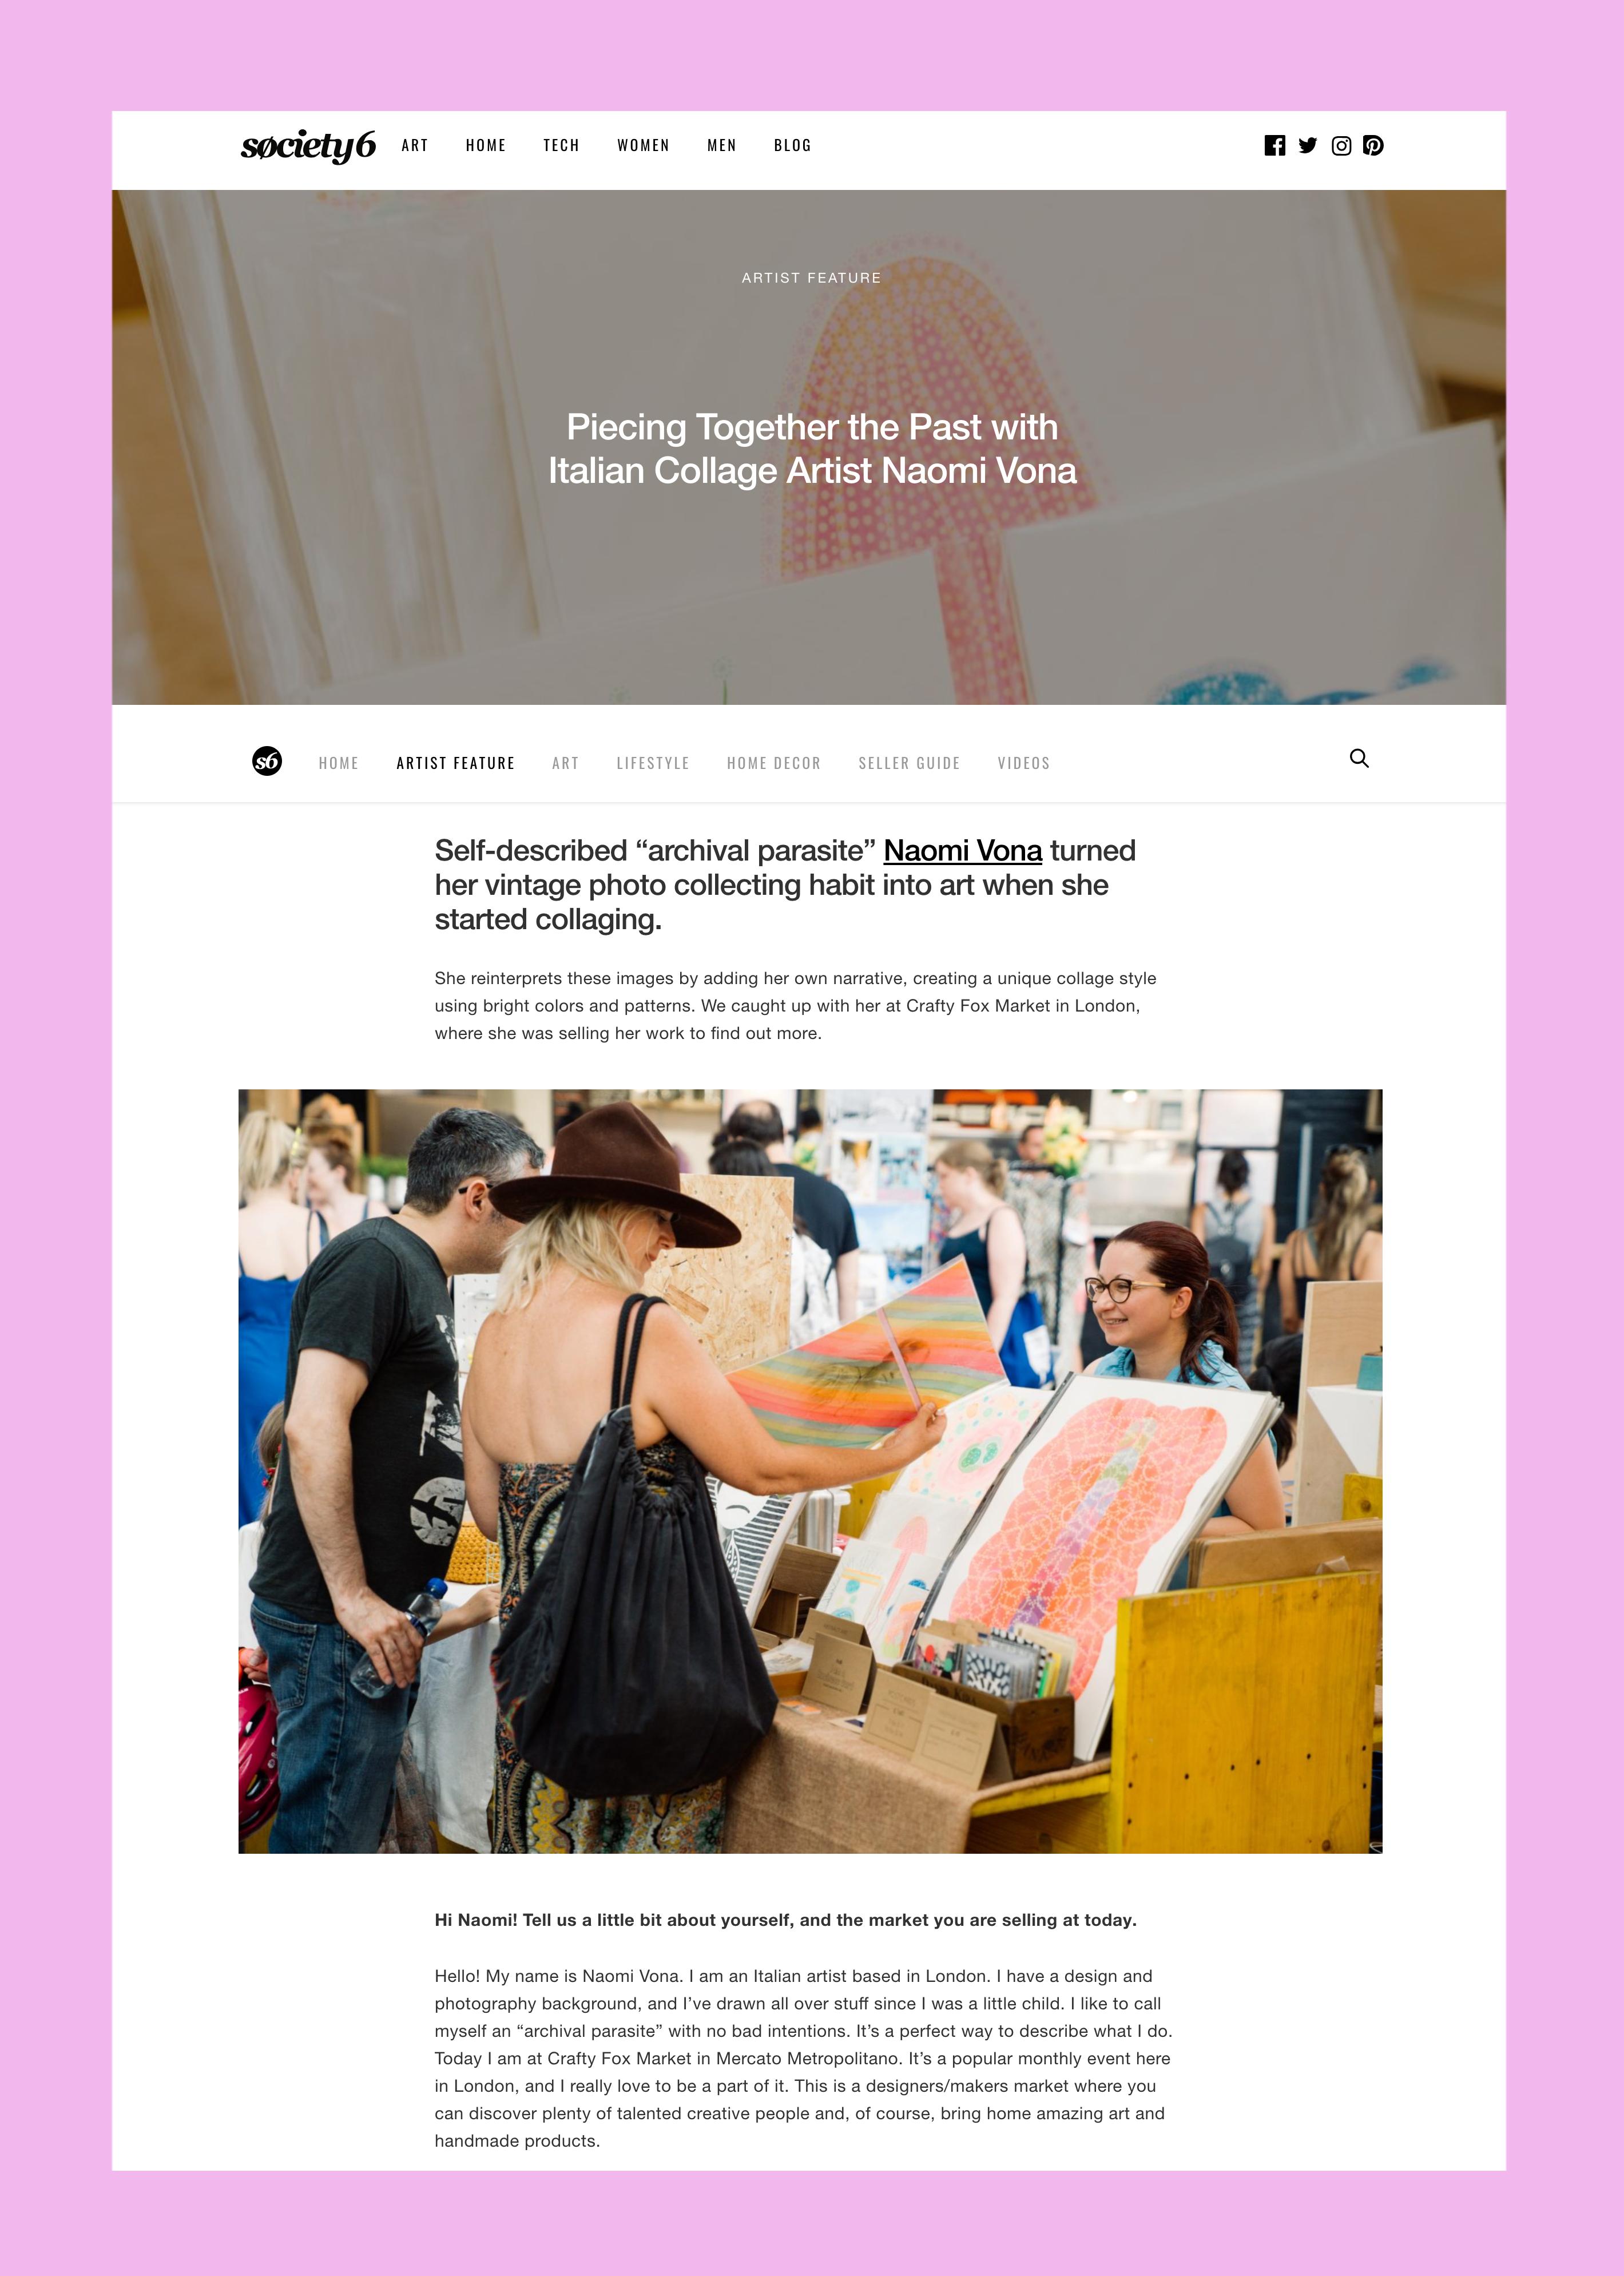 Screenshot of blog post.